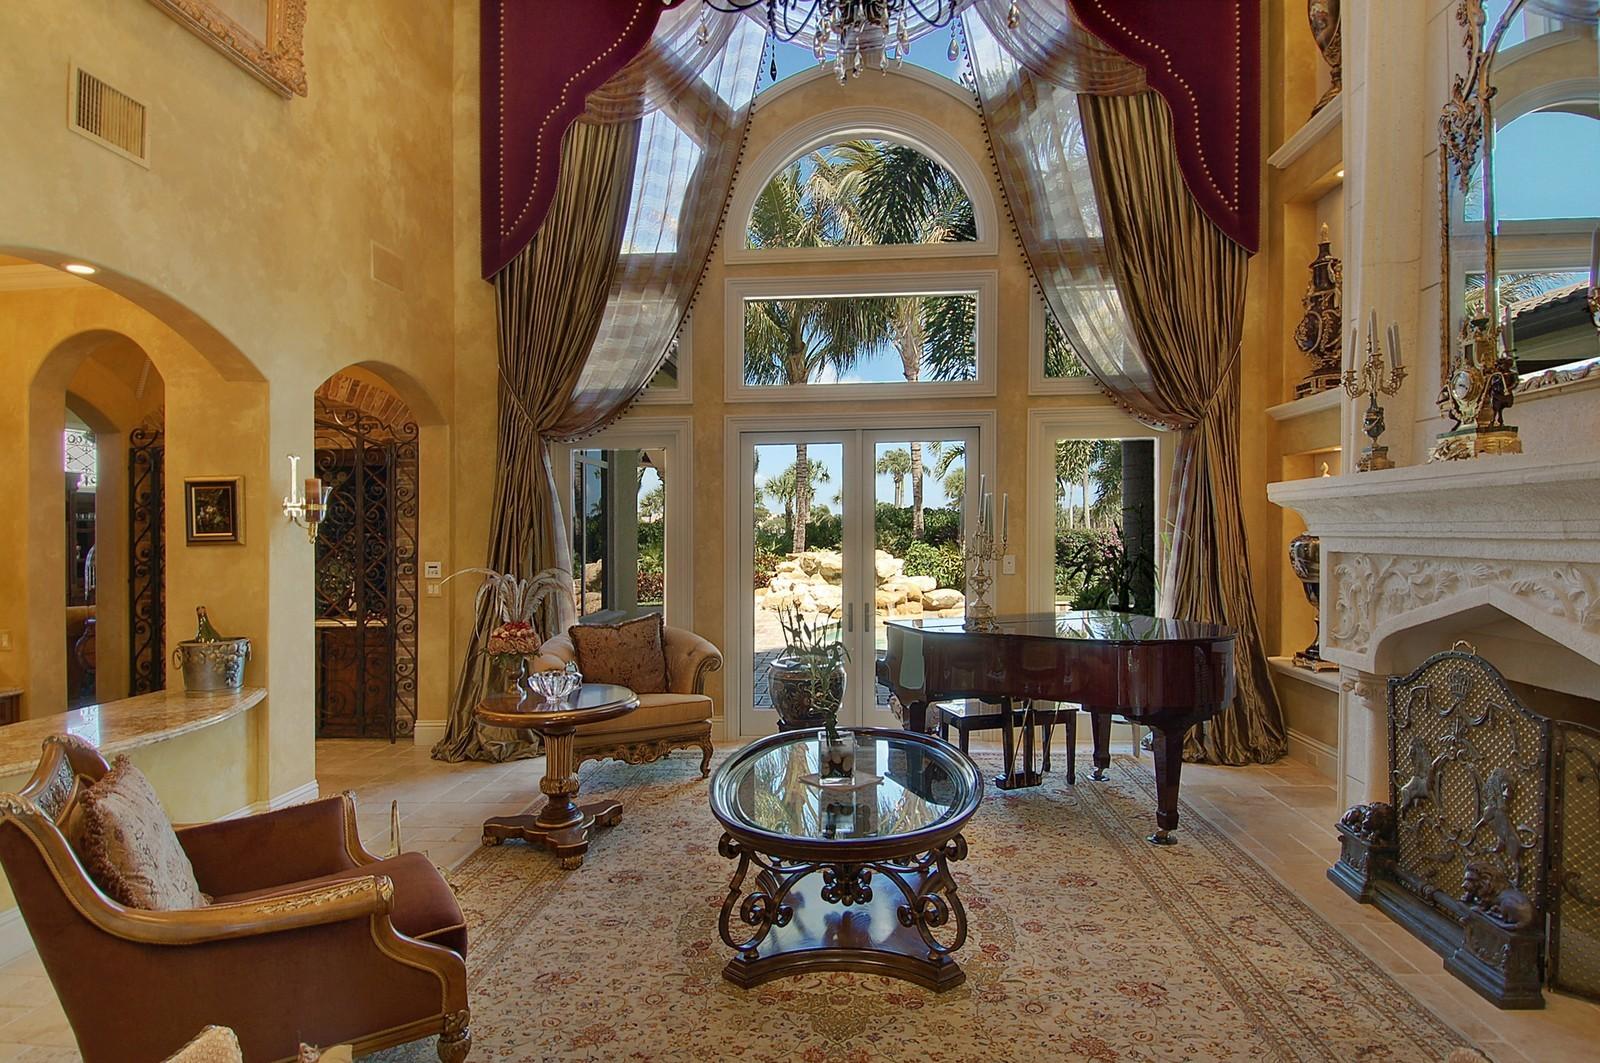 Real Estate Photography - 215 Royal Palm Way, Boca Raton, FL, 33432 - Living Room